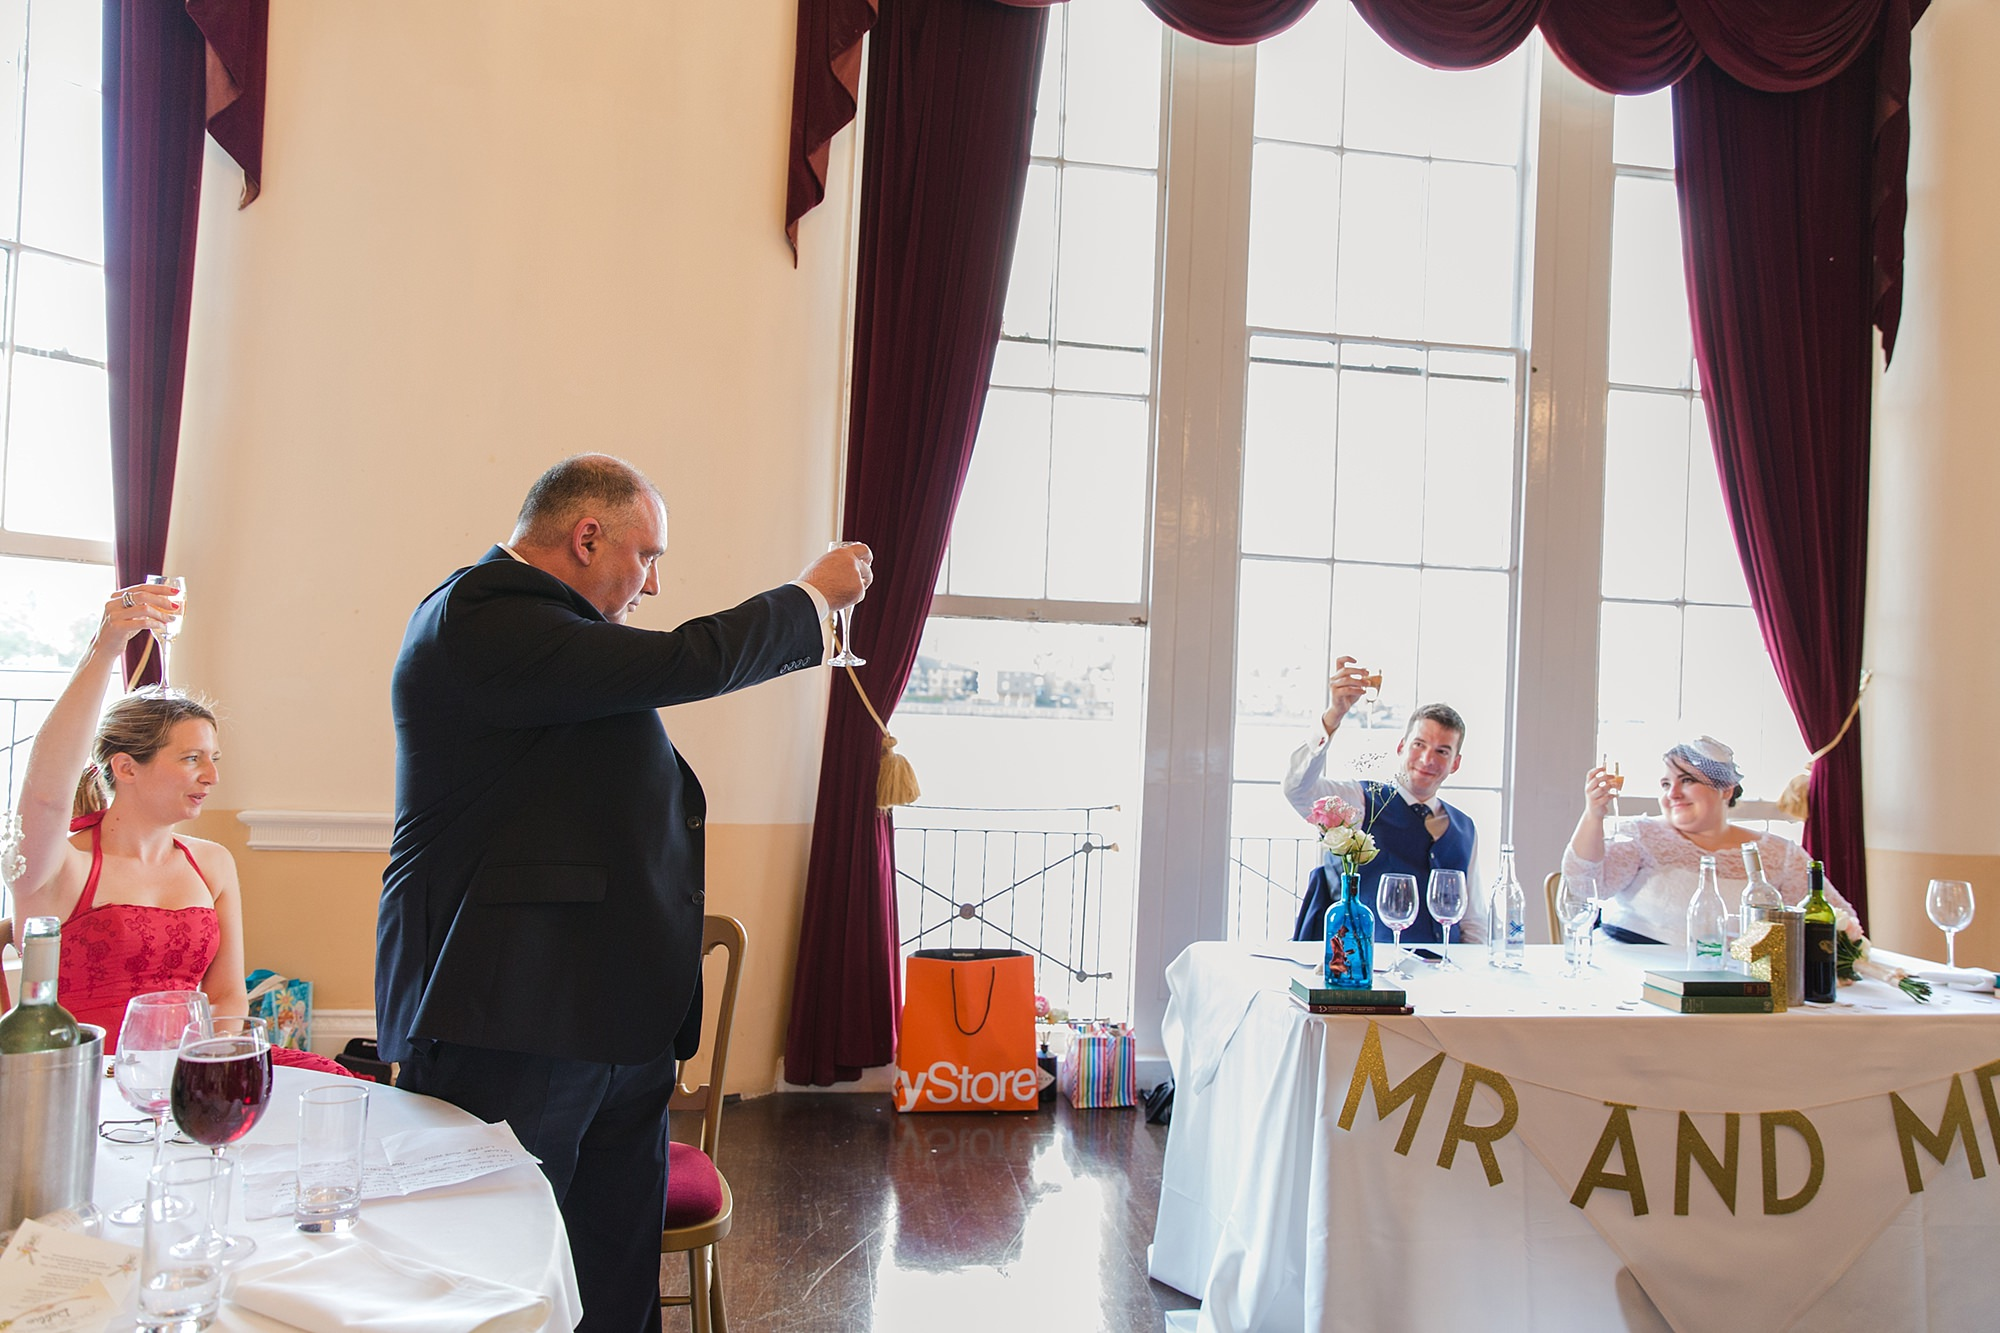 Trafalgar Tavern wedding father of bride's speech